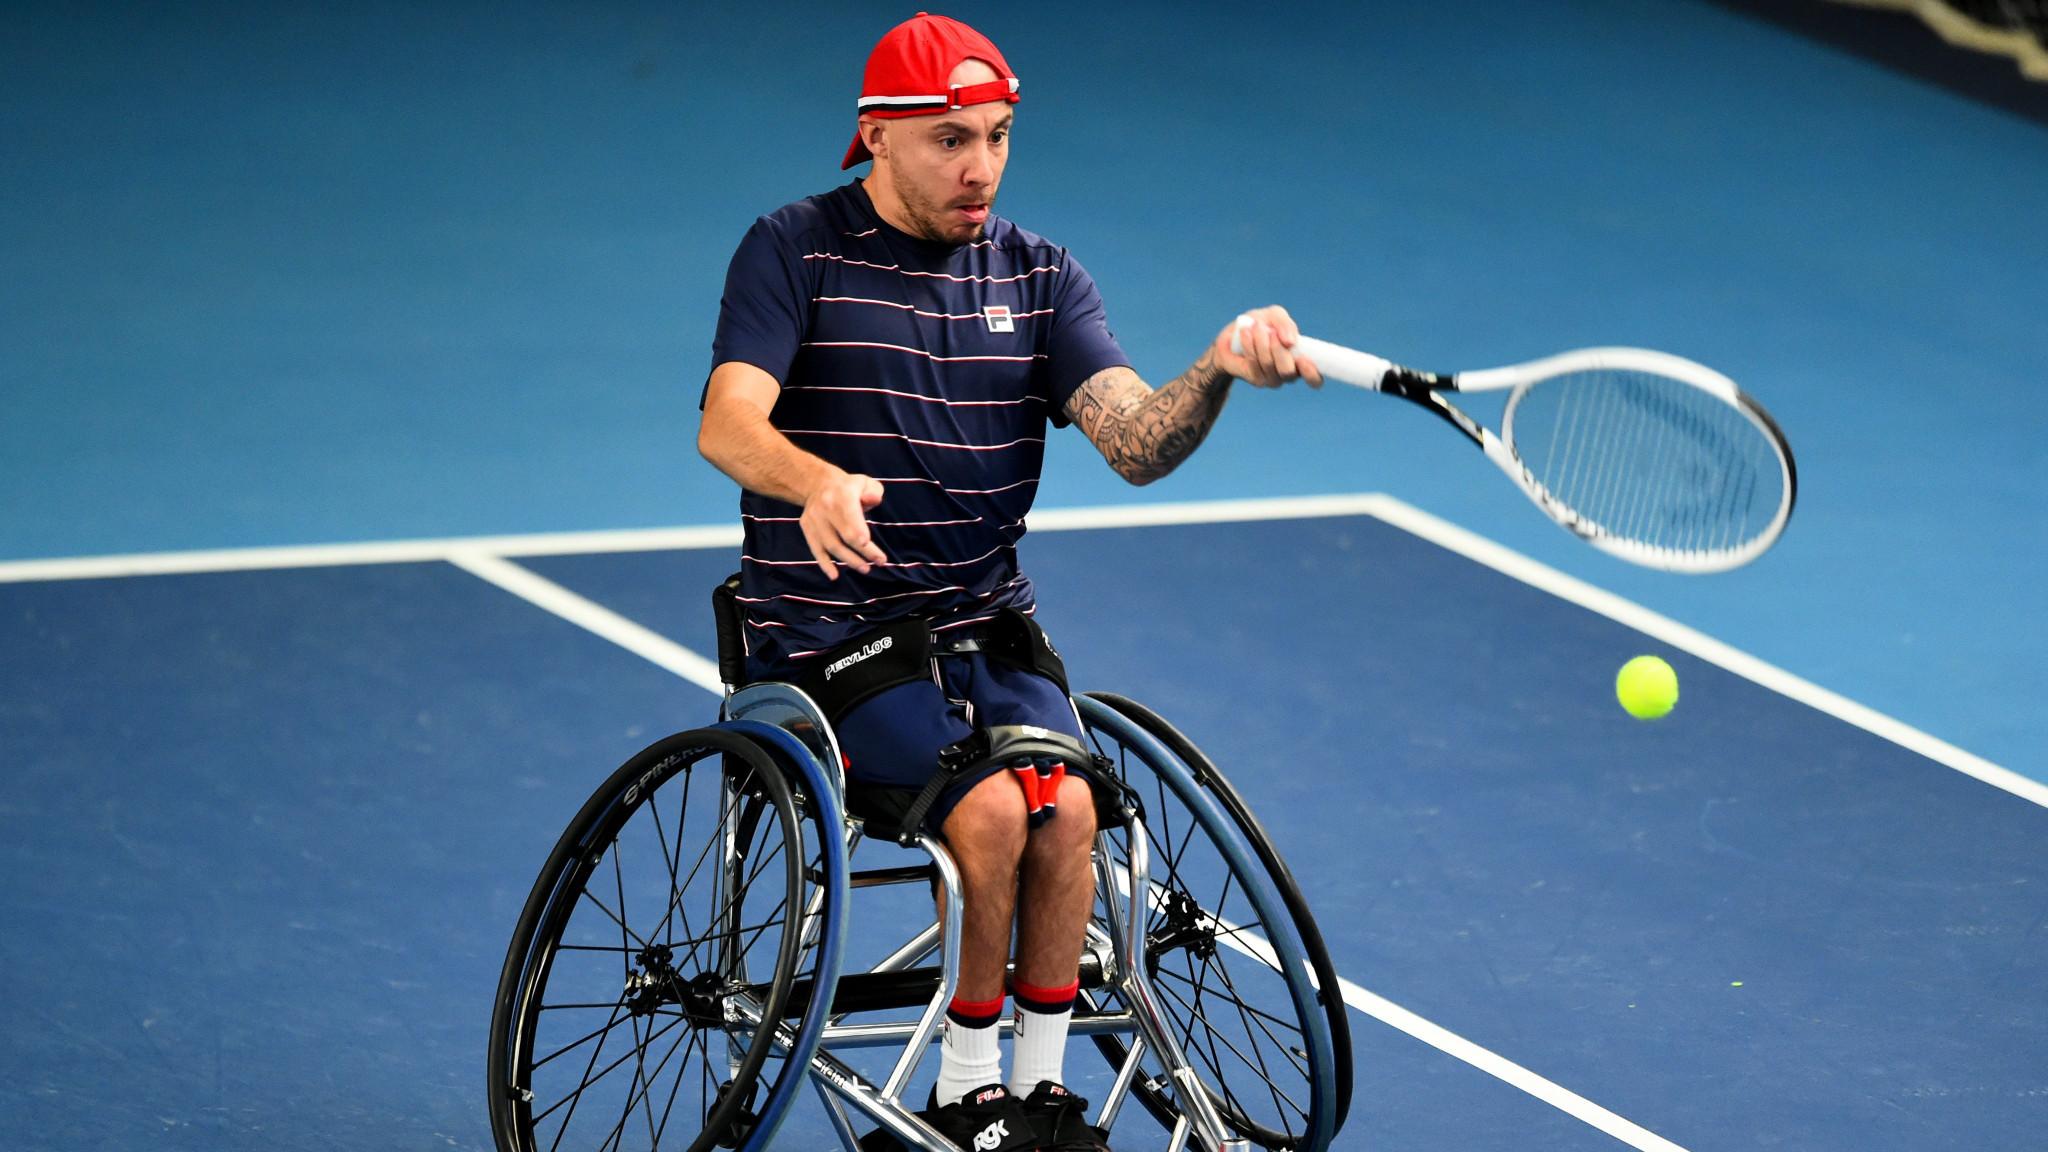 Grand Slam champions headline inaugural LTA Wheelchair Team Battle